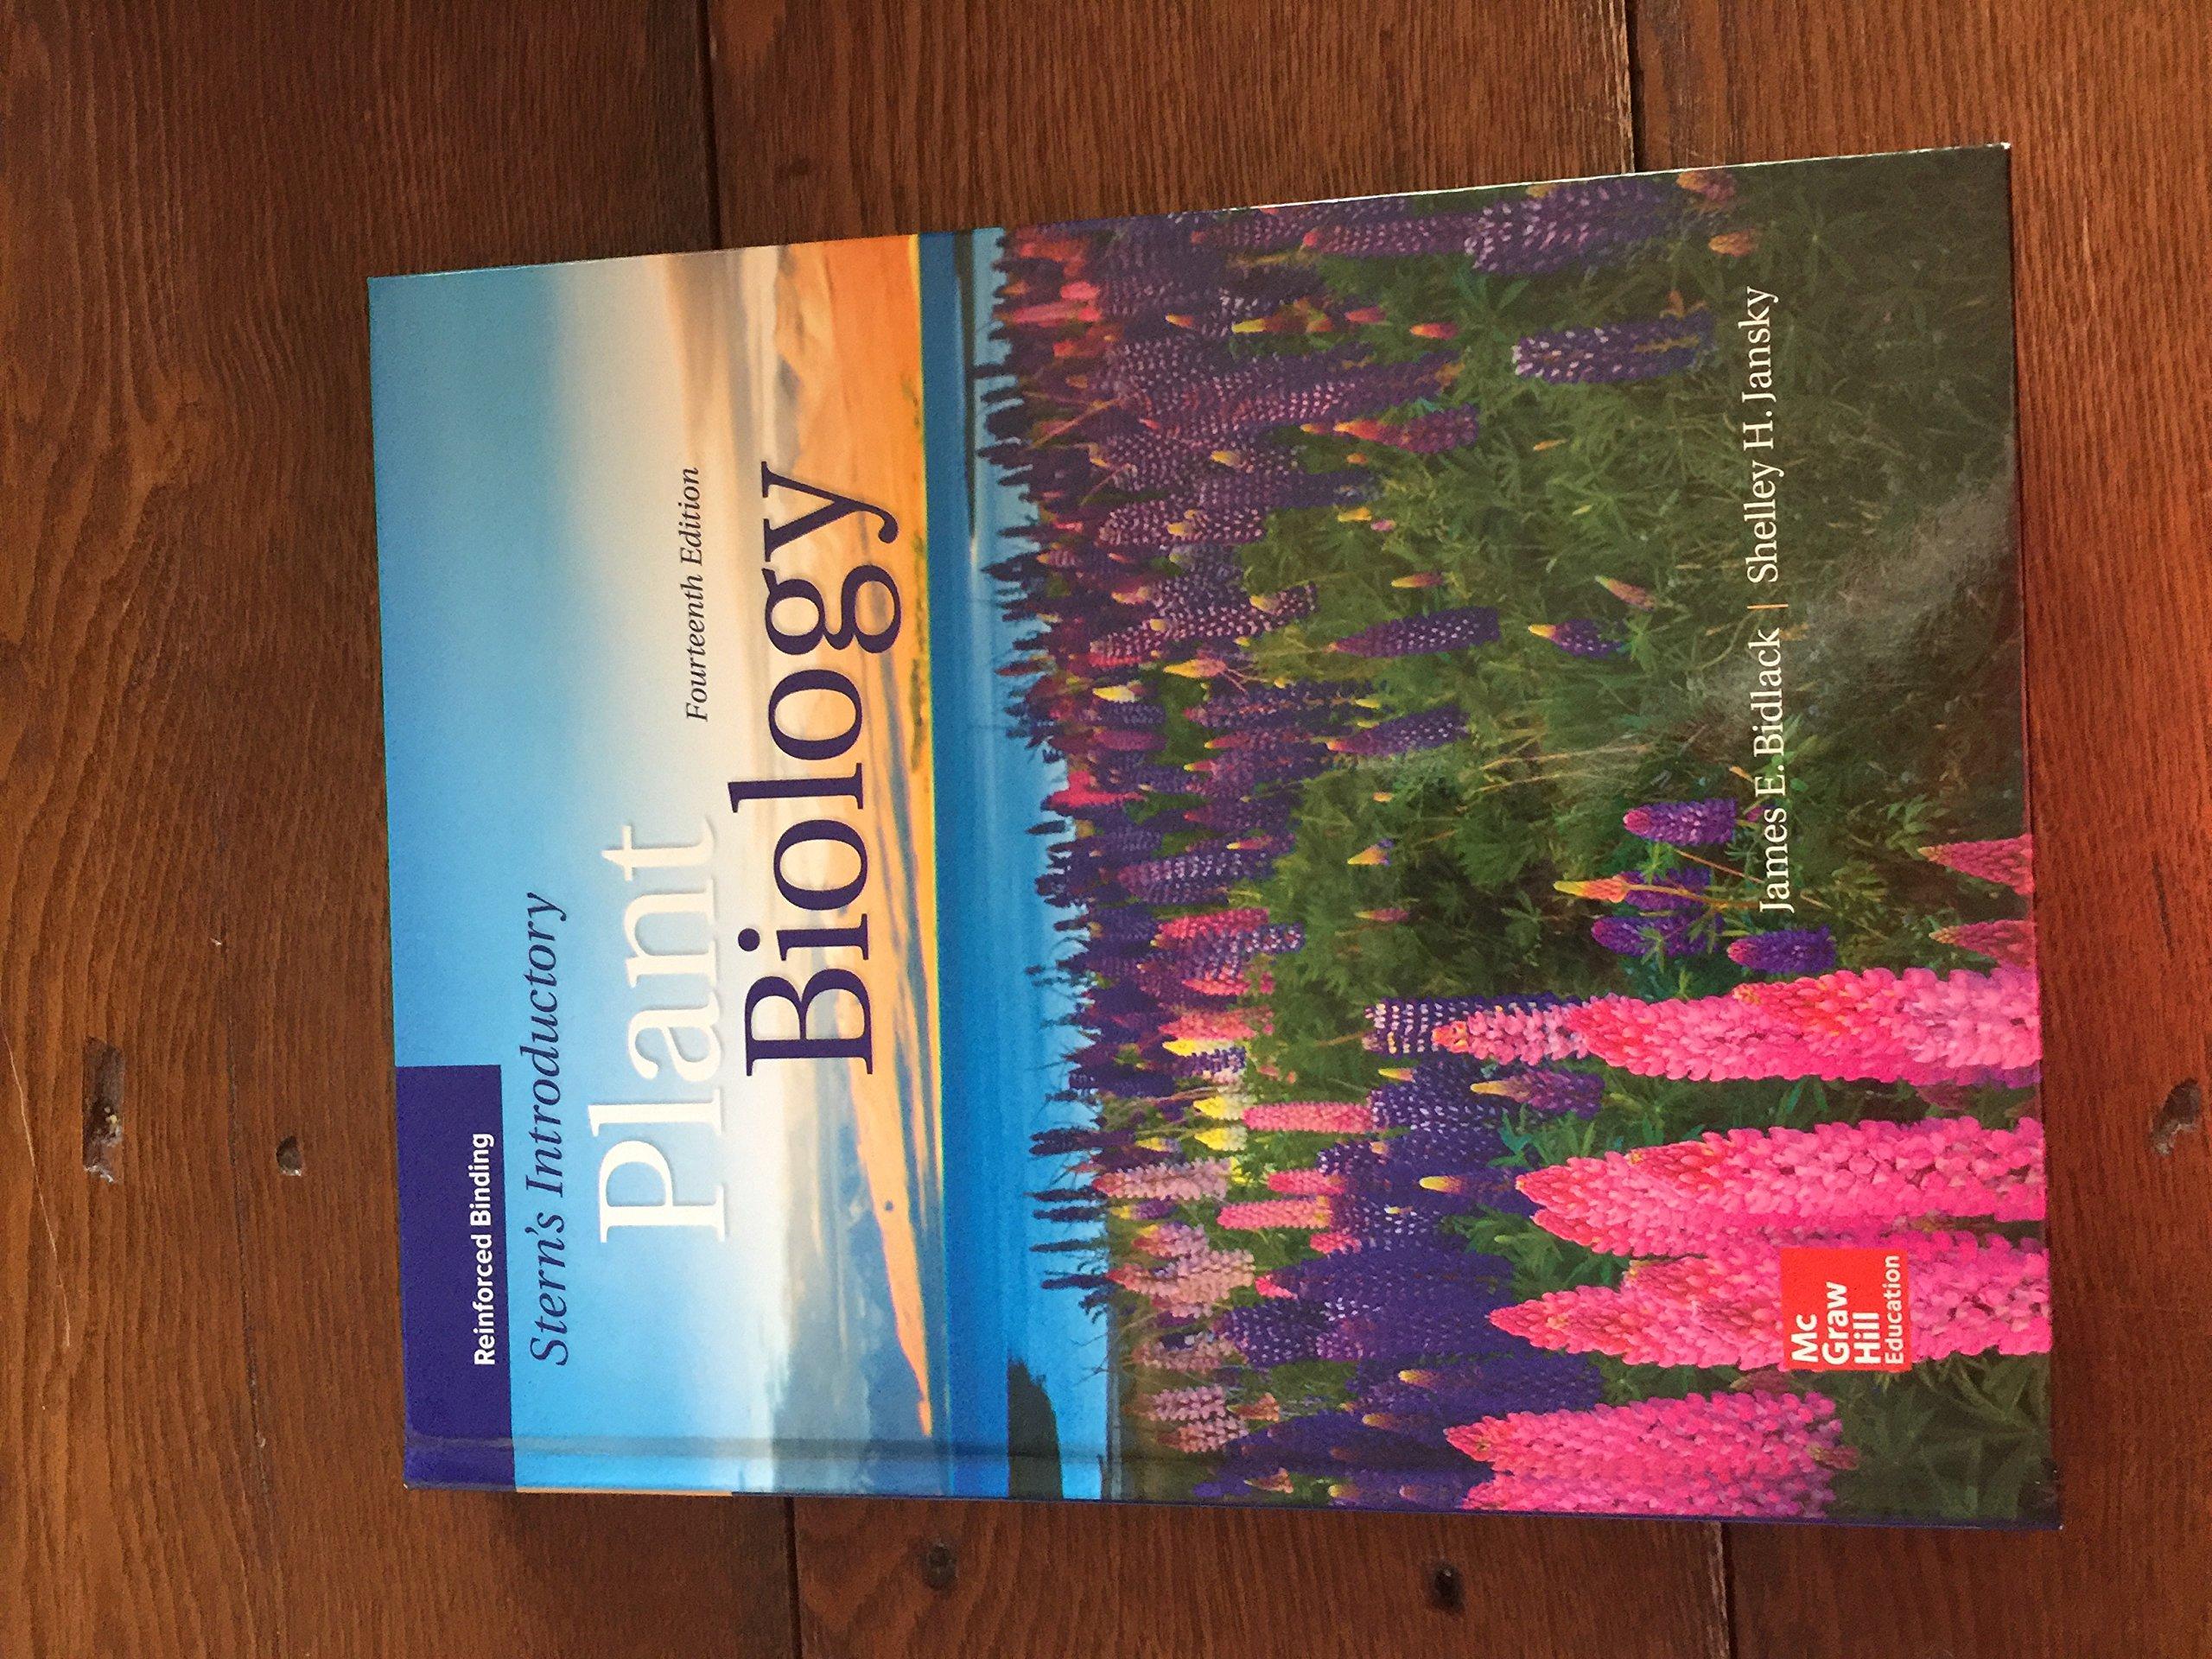 Stern's Introductory Plant Biology 14th Edition: James E Bidlack and  Shelley H Jansky, Ratnakorn Piyasirisorost/Getty Images: 9780078997341:  Amazon.com: ...